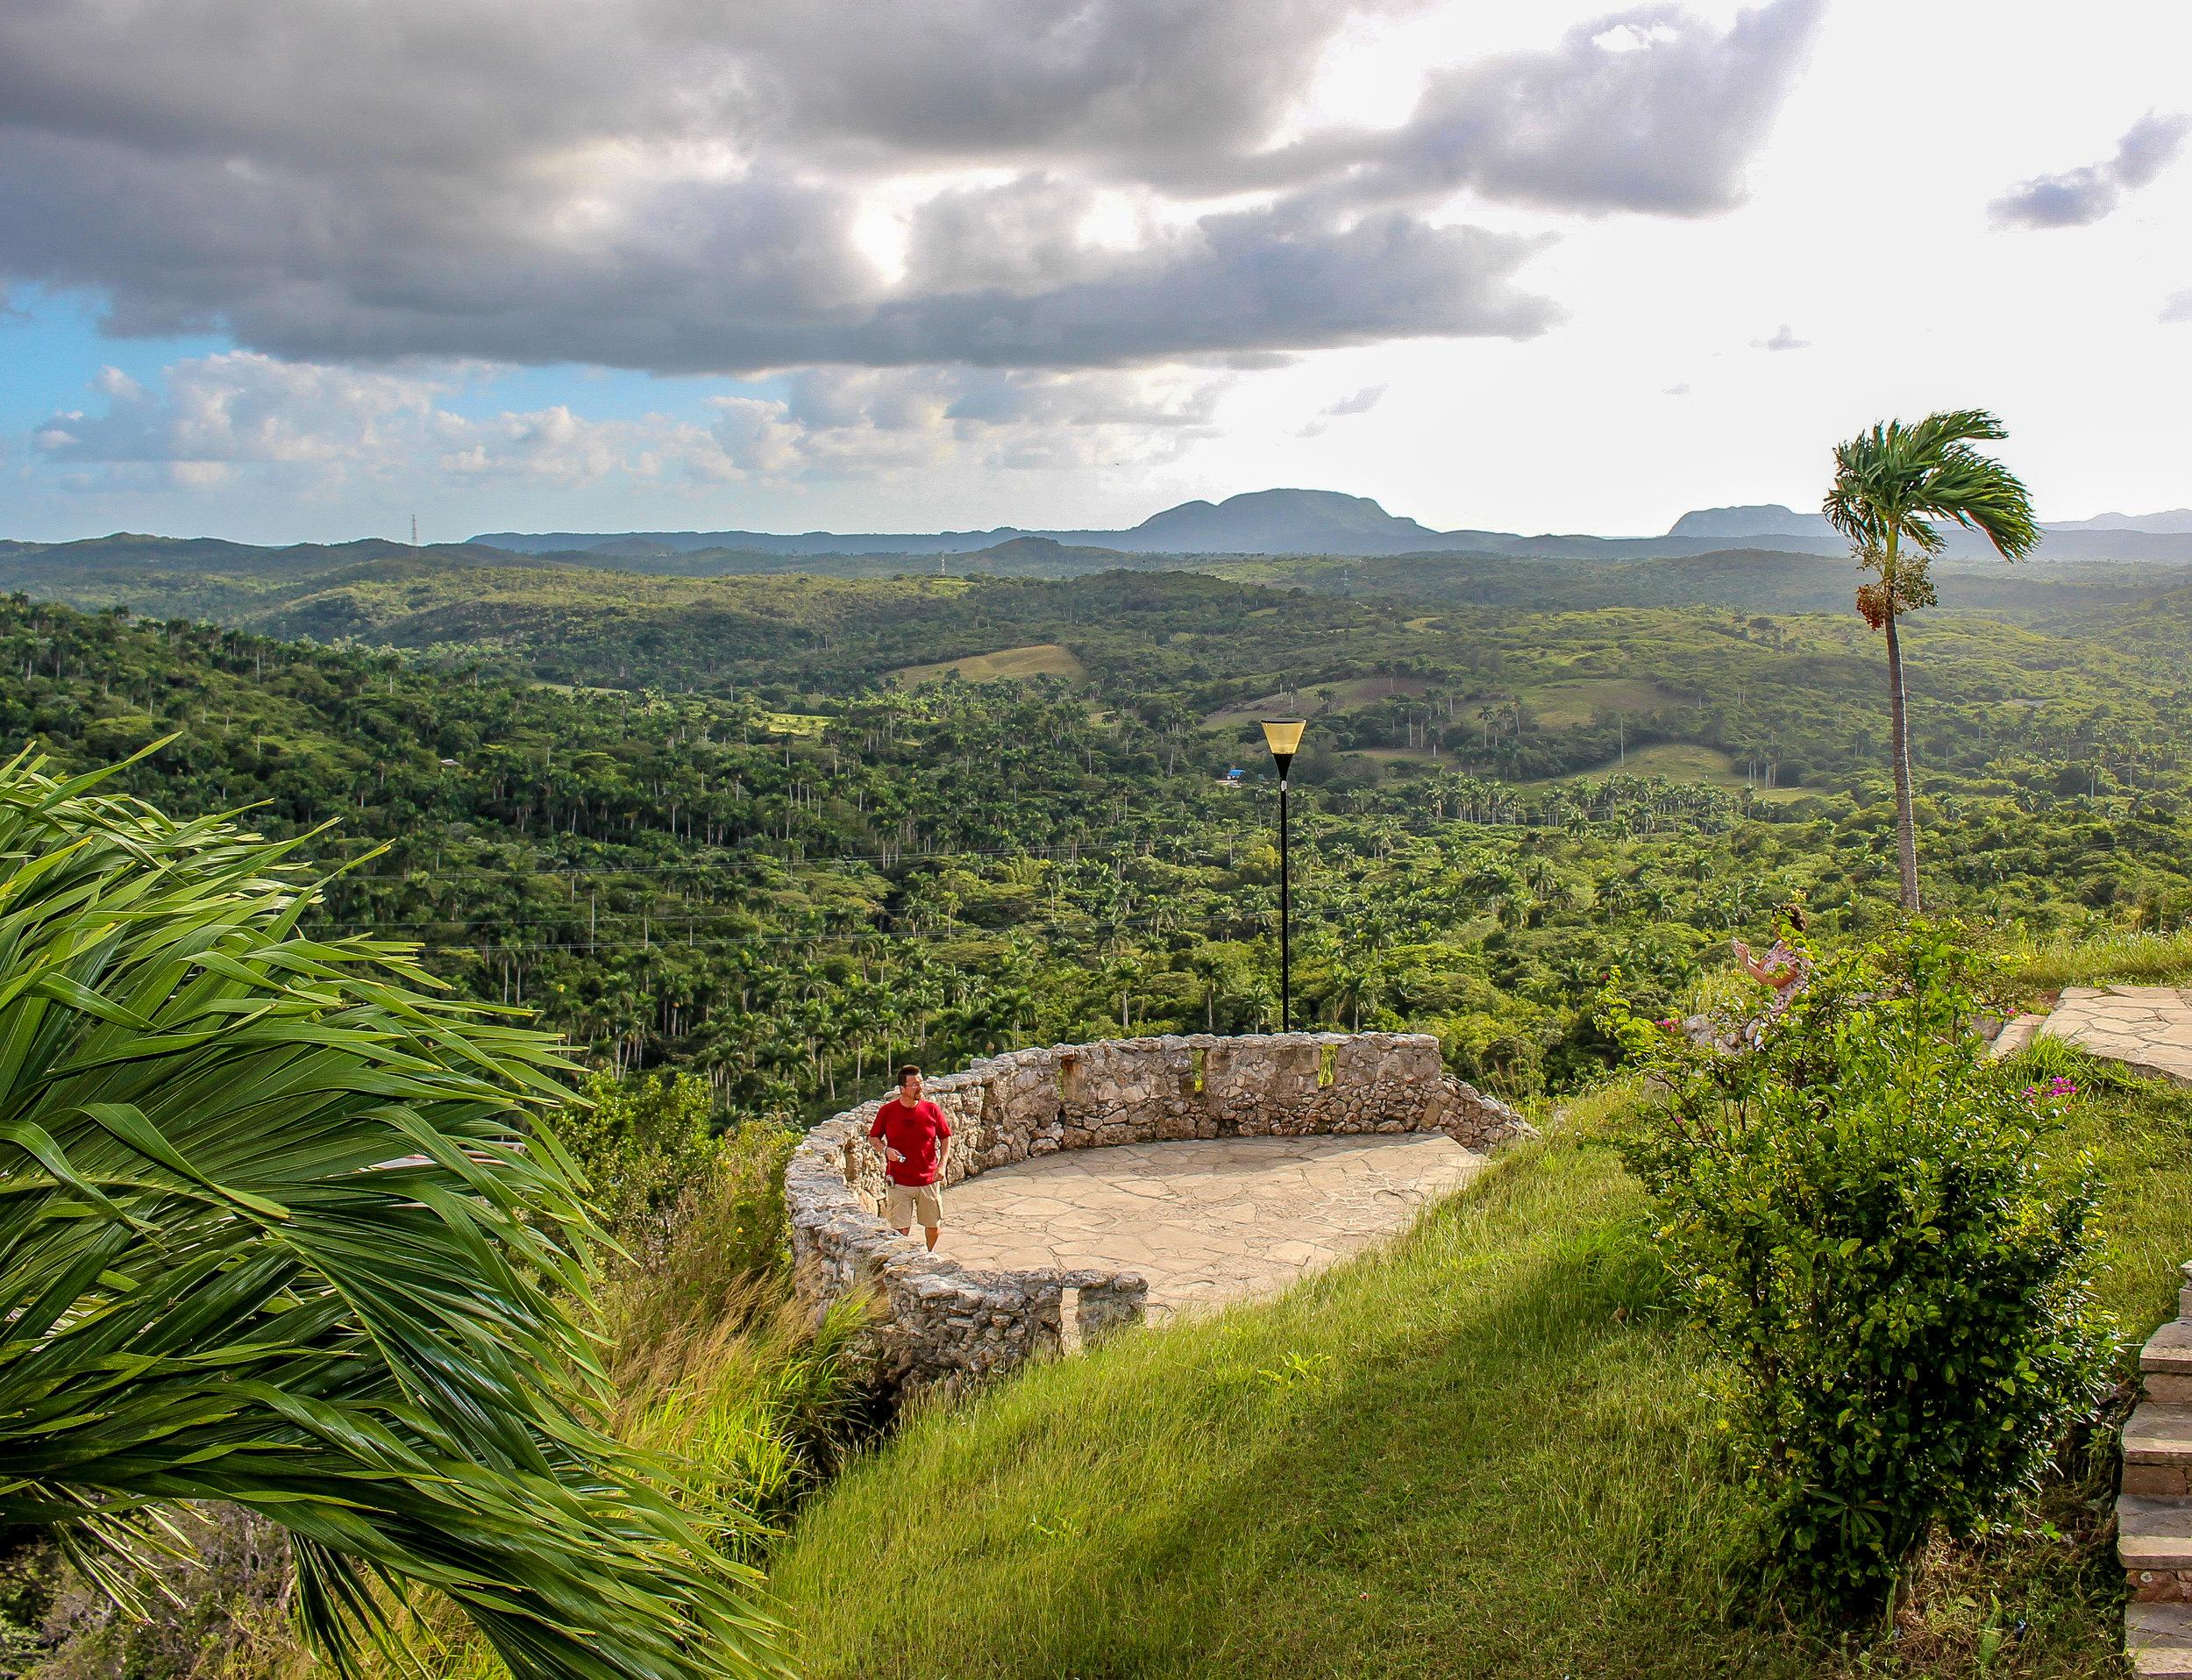 View of the Valley from El Mirador